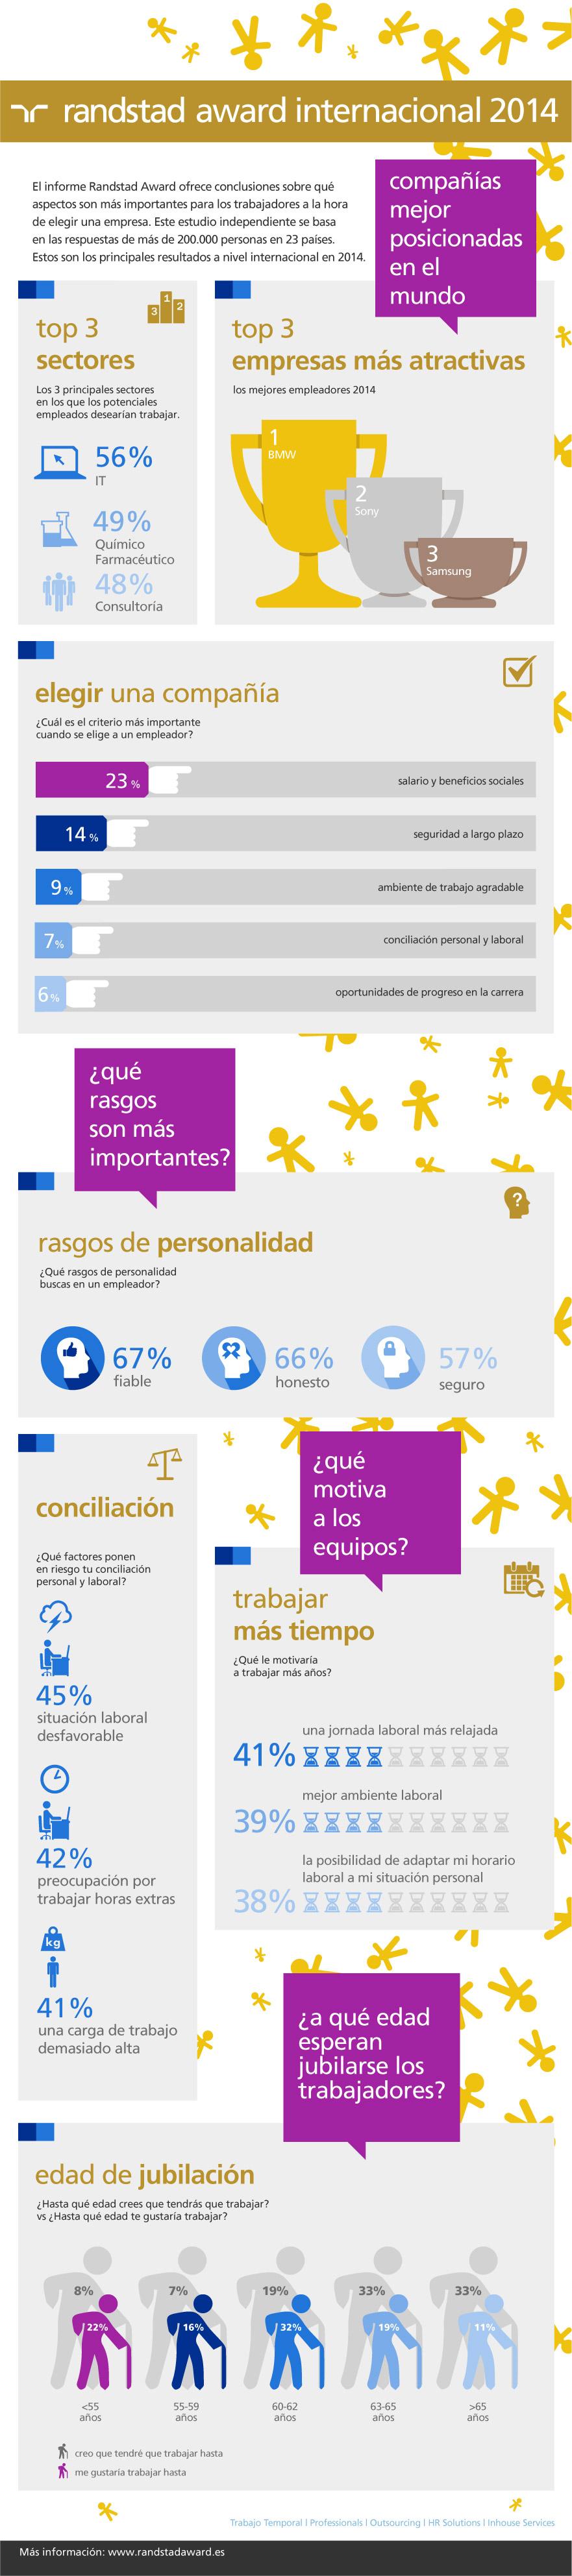 infografia-randstad-award-internacional-2014.jpg